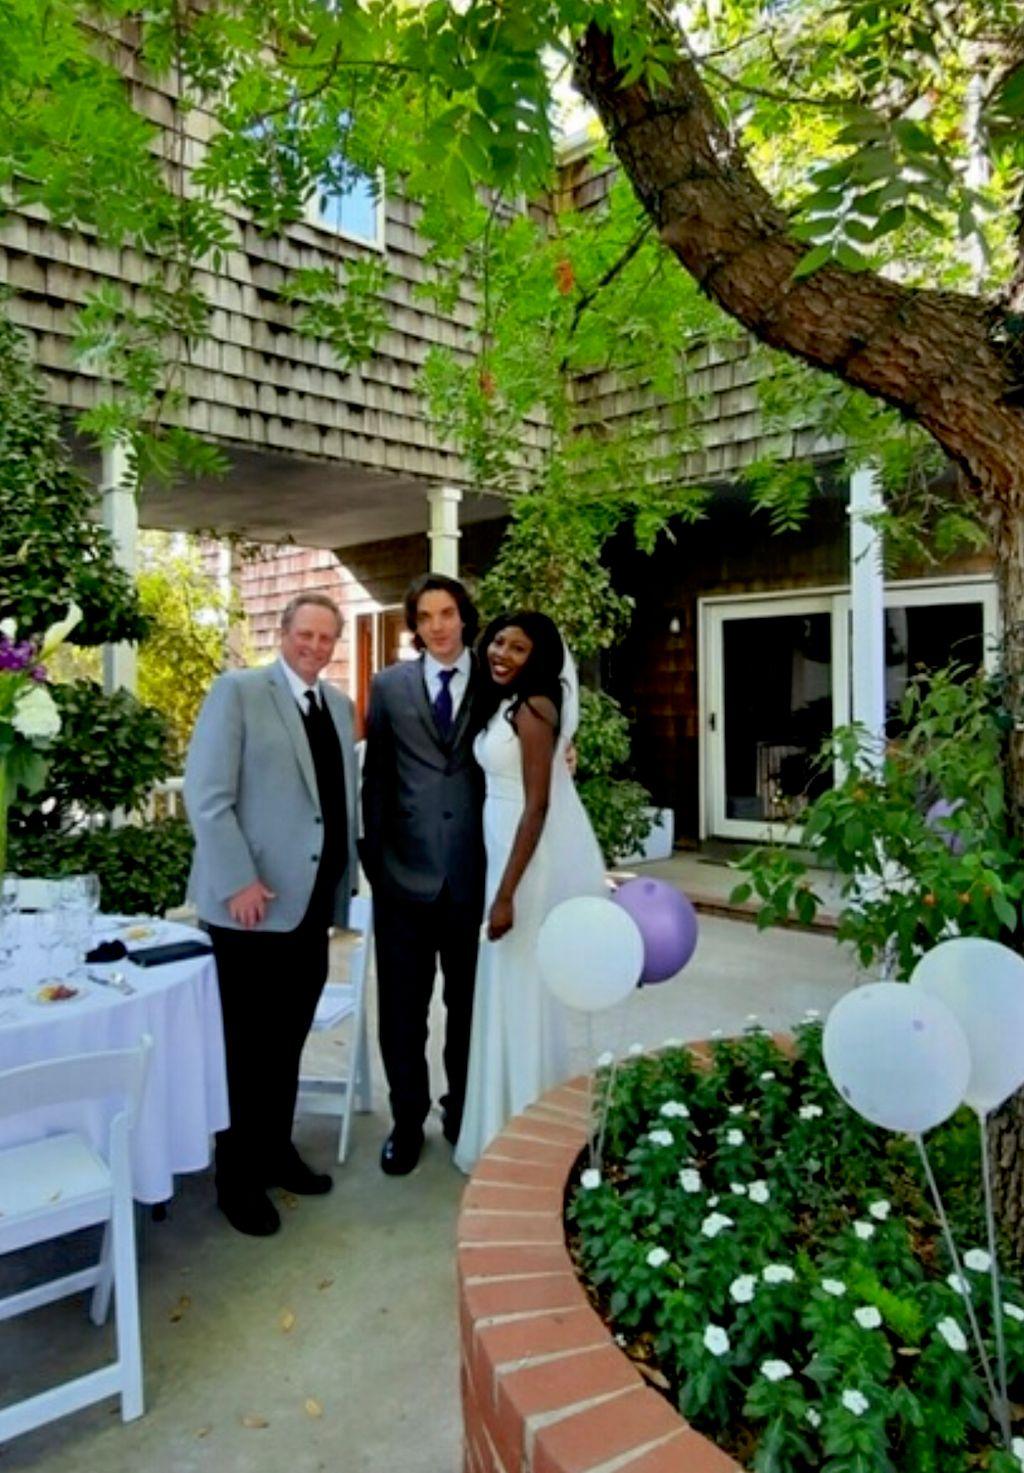 Wedding Officiant - Davis 2020